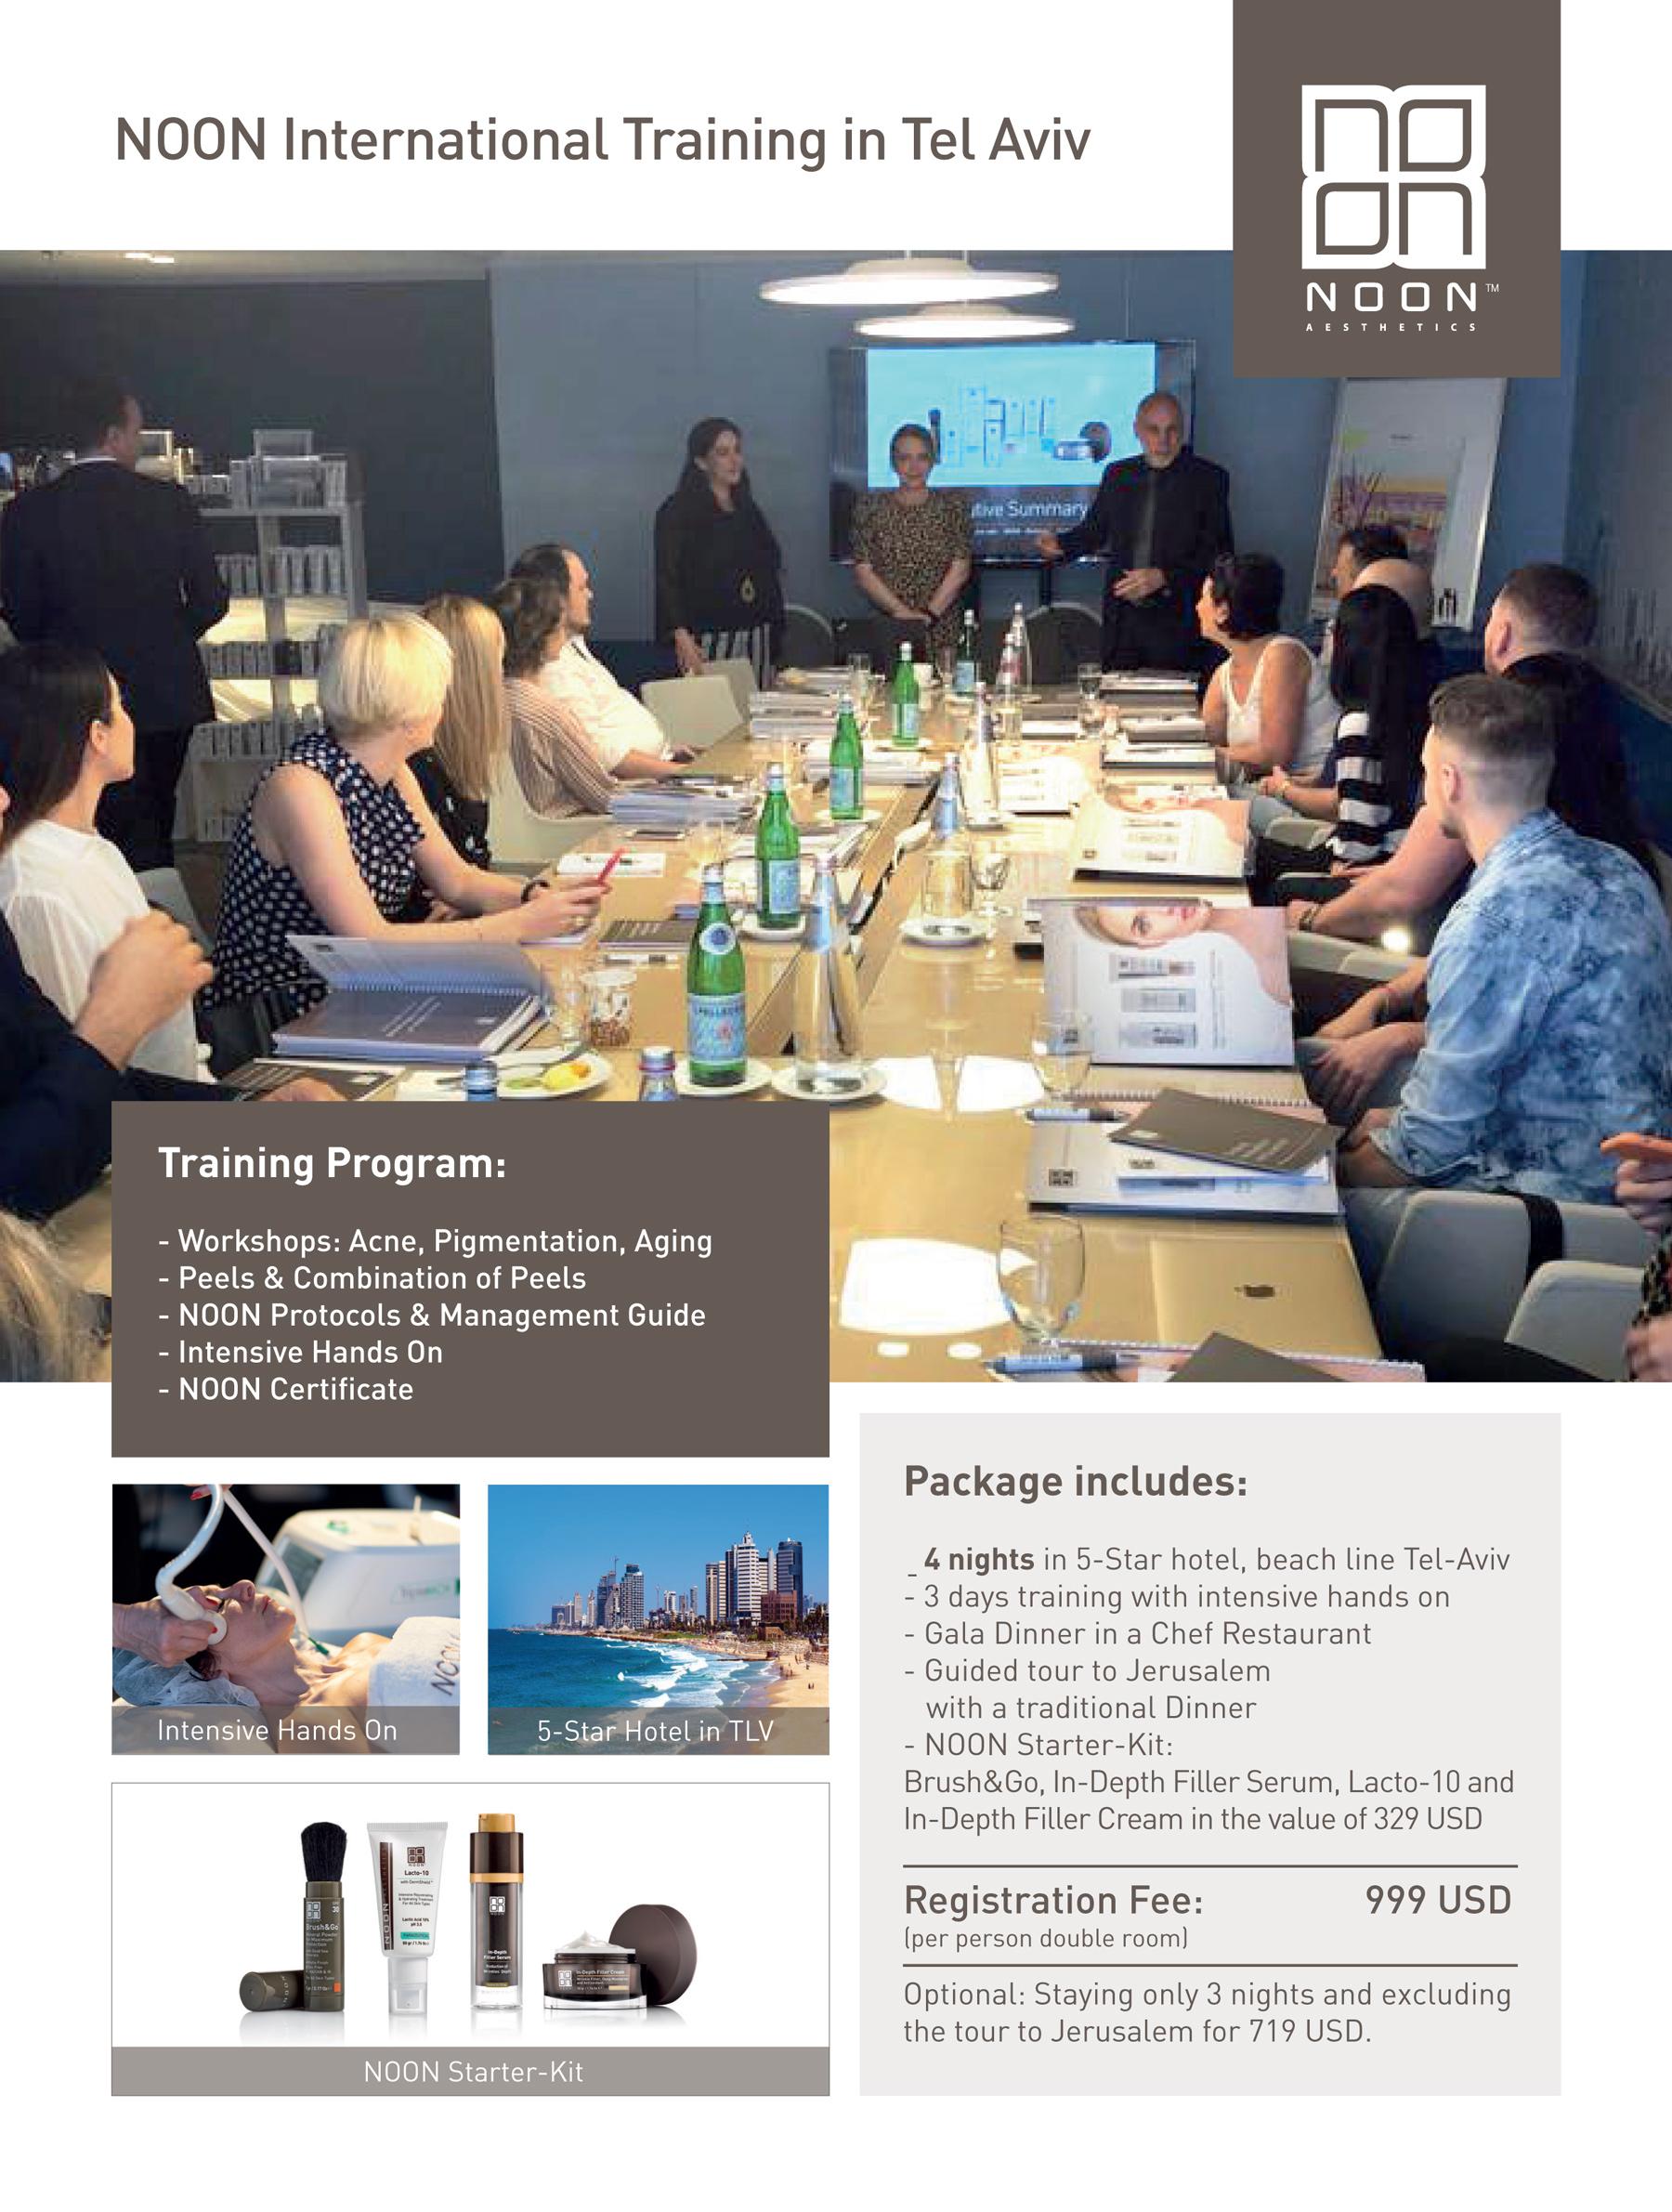 NOON_Training_Brochure_Telaviv_USD